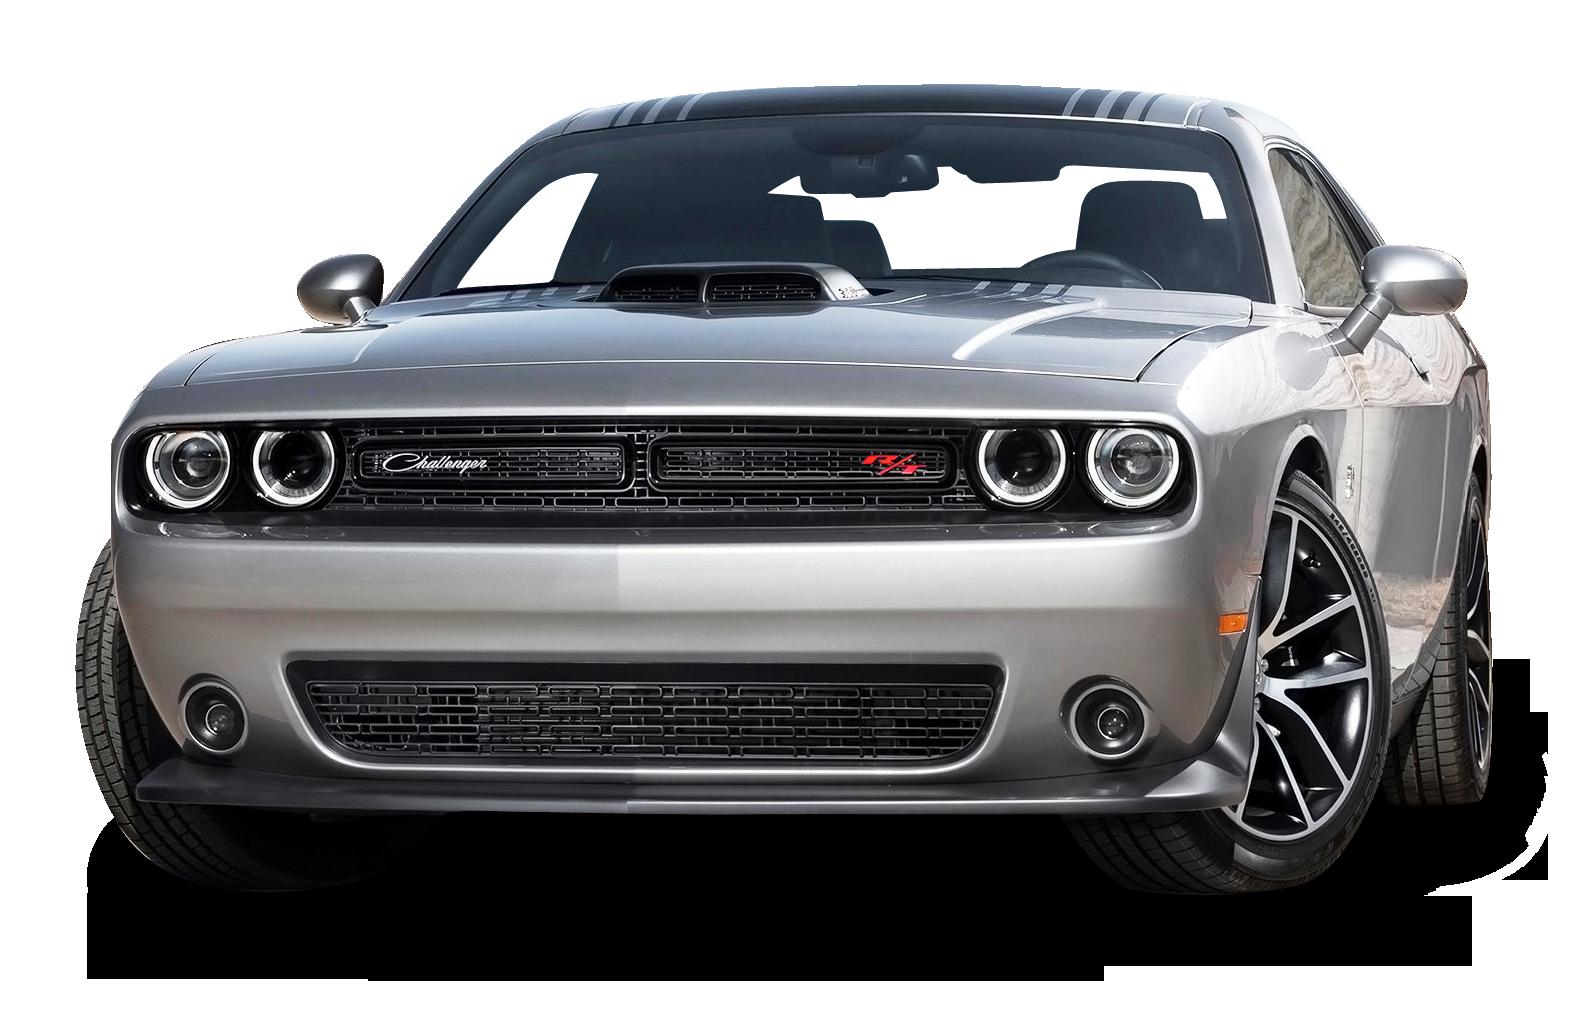 Gray Dodge Challenger Car